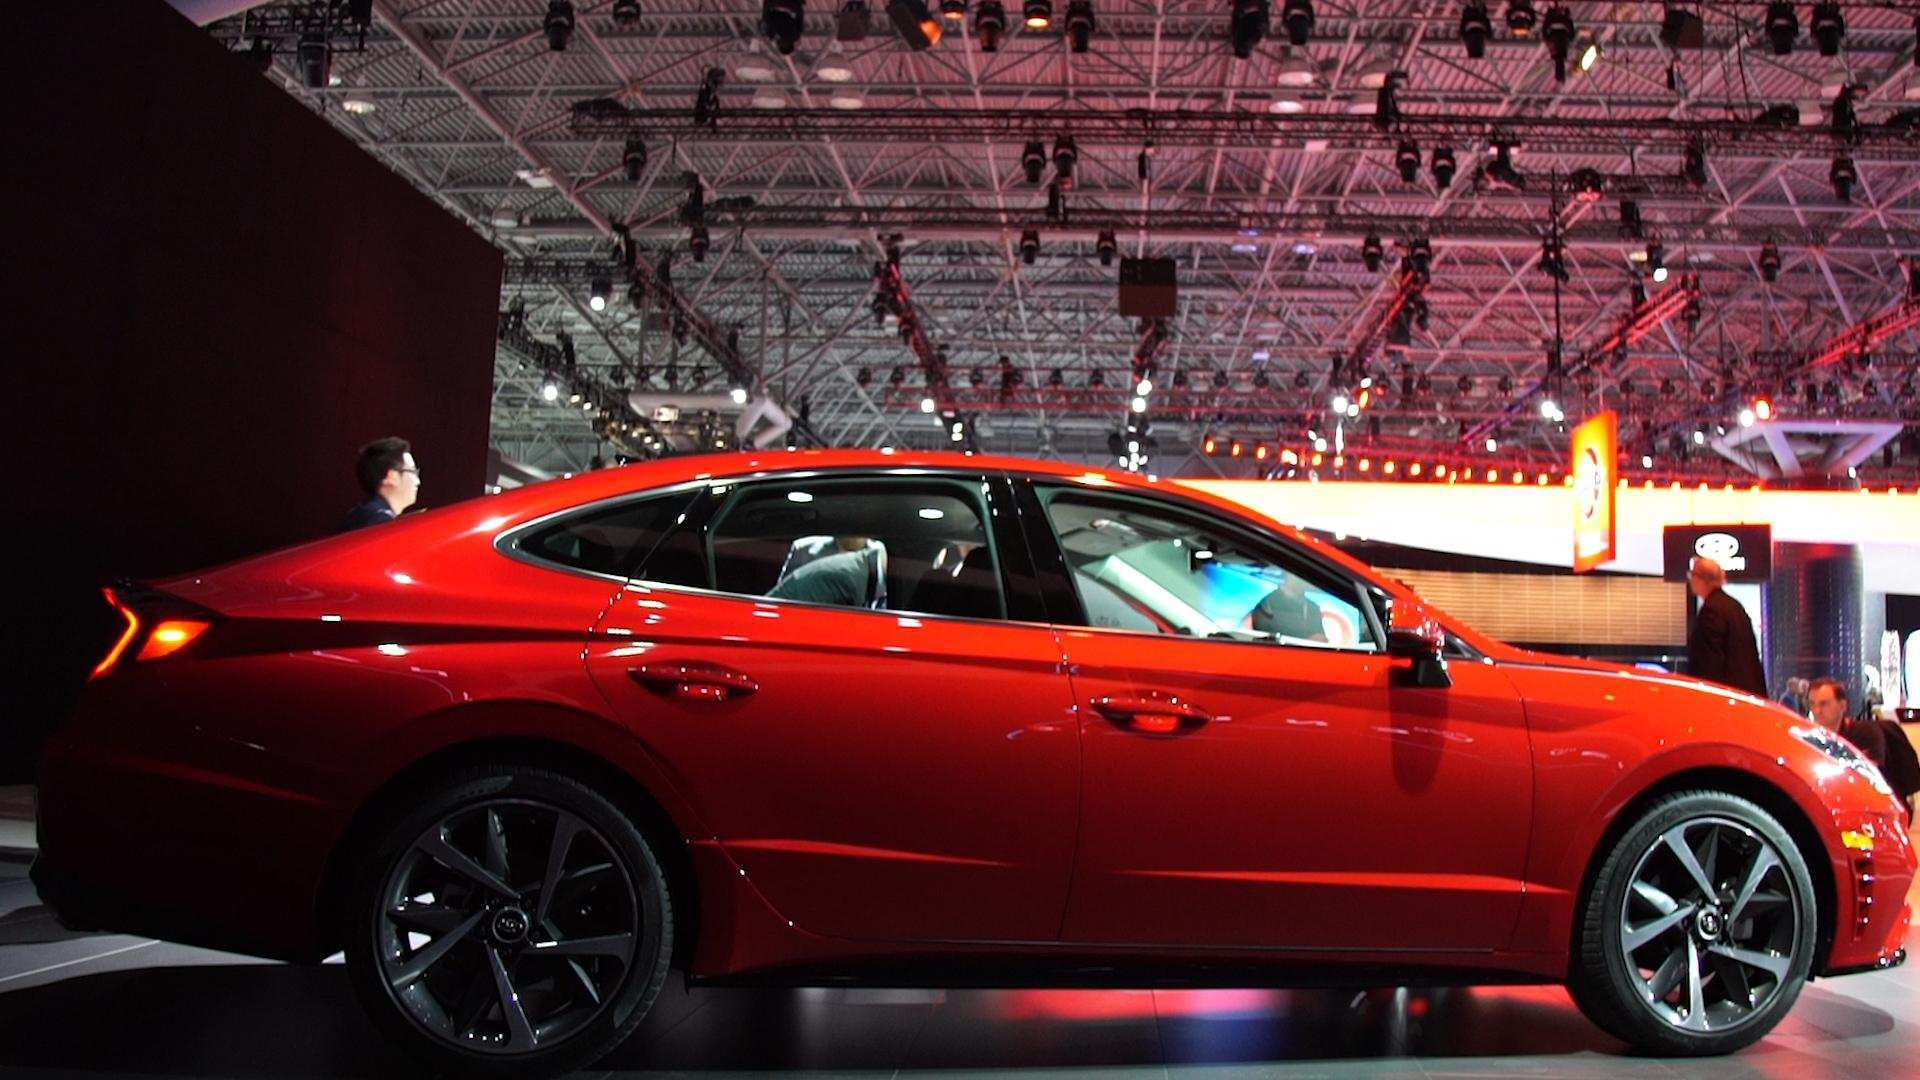 15 Gallery of When Will The 2020 Hyundai Sonata Be Available Prices by When Will The 2020 Hyundai Sonata Be Available